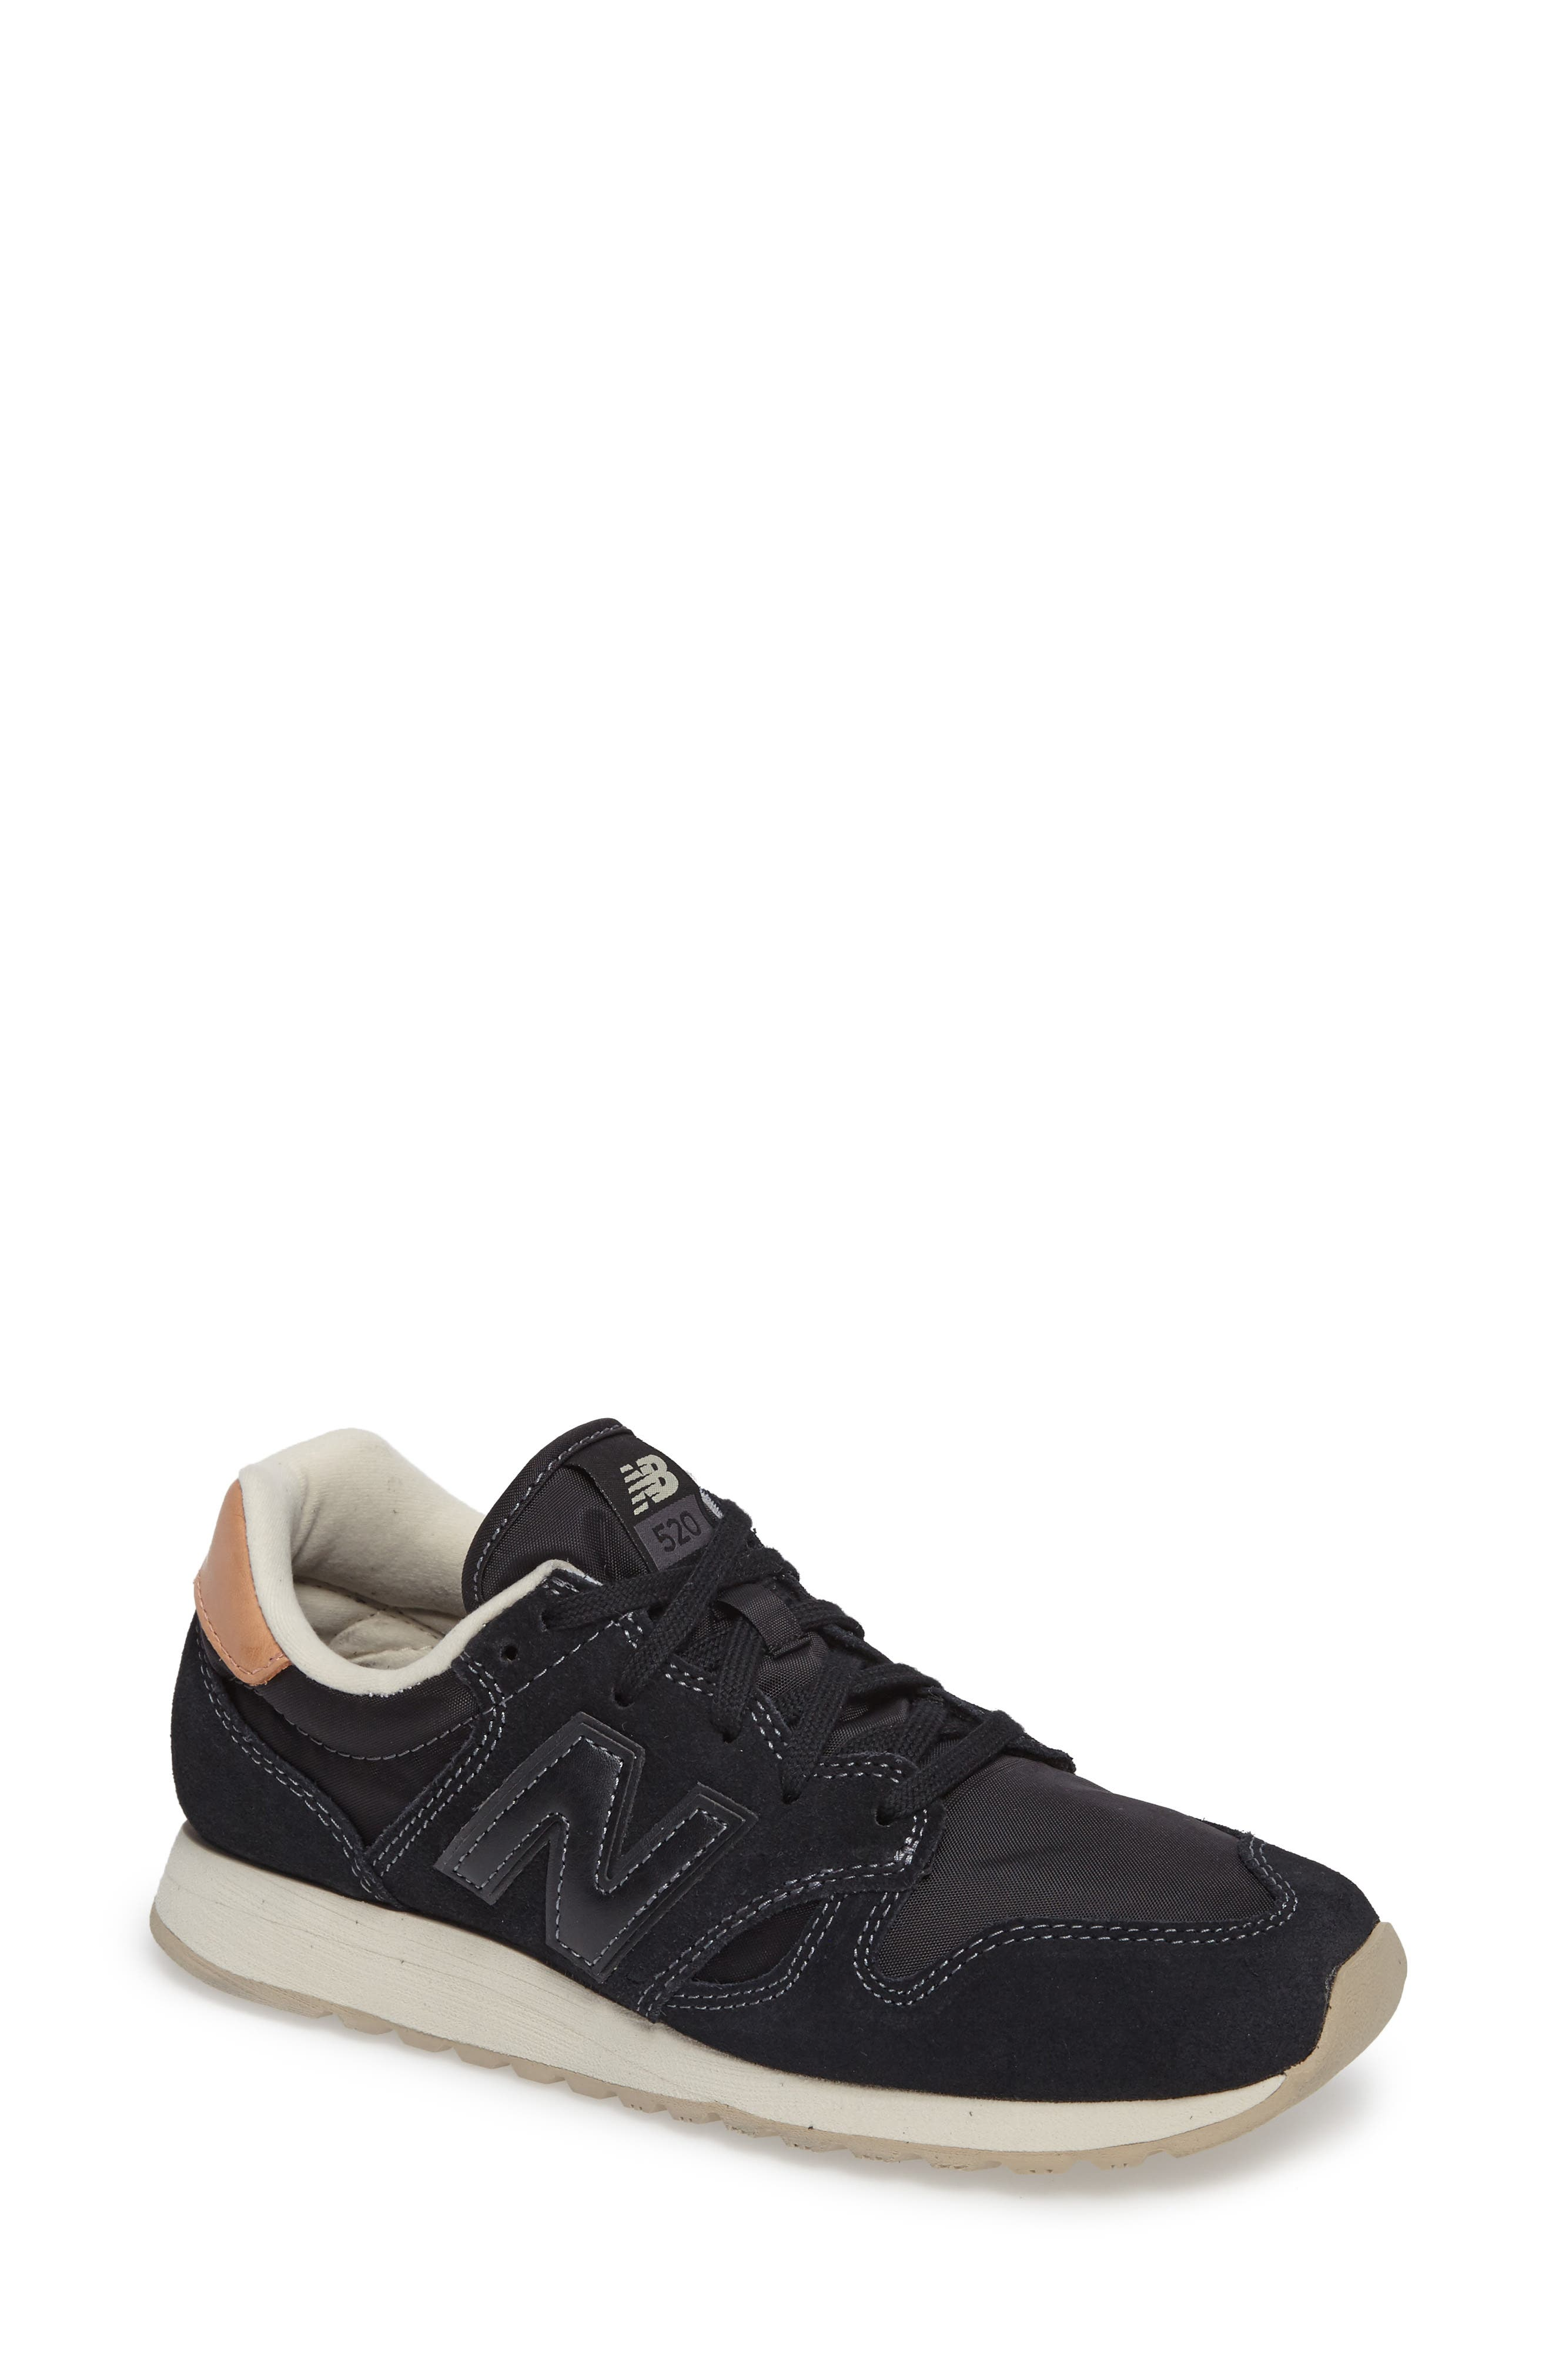 Main Image - New Balance 520 Sneaker (Women)